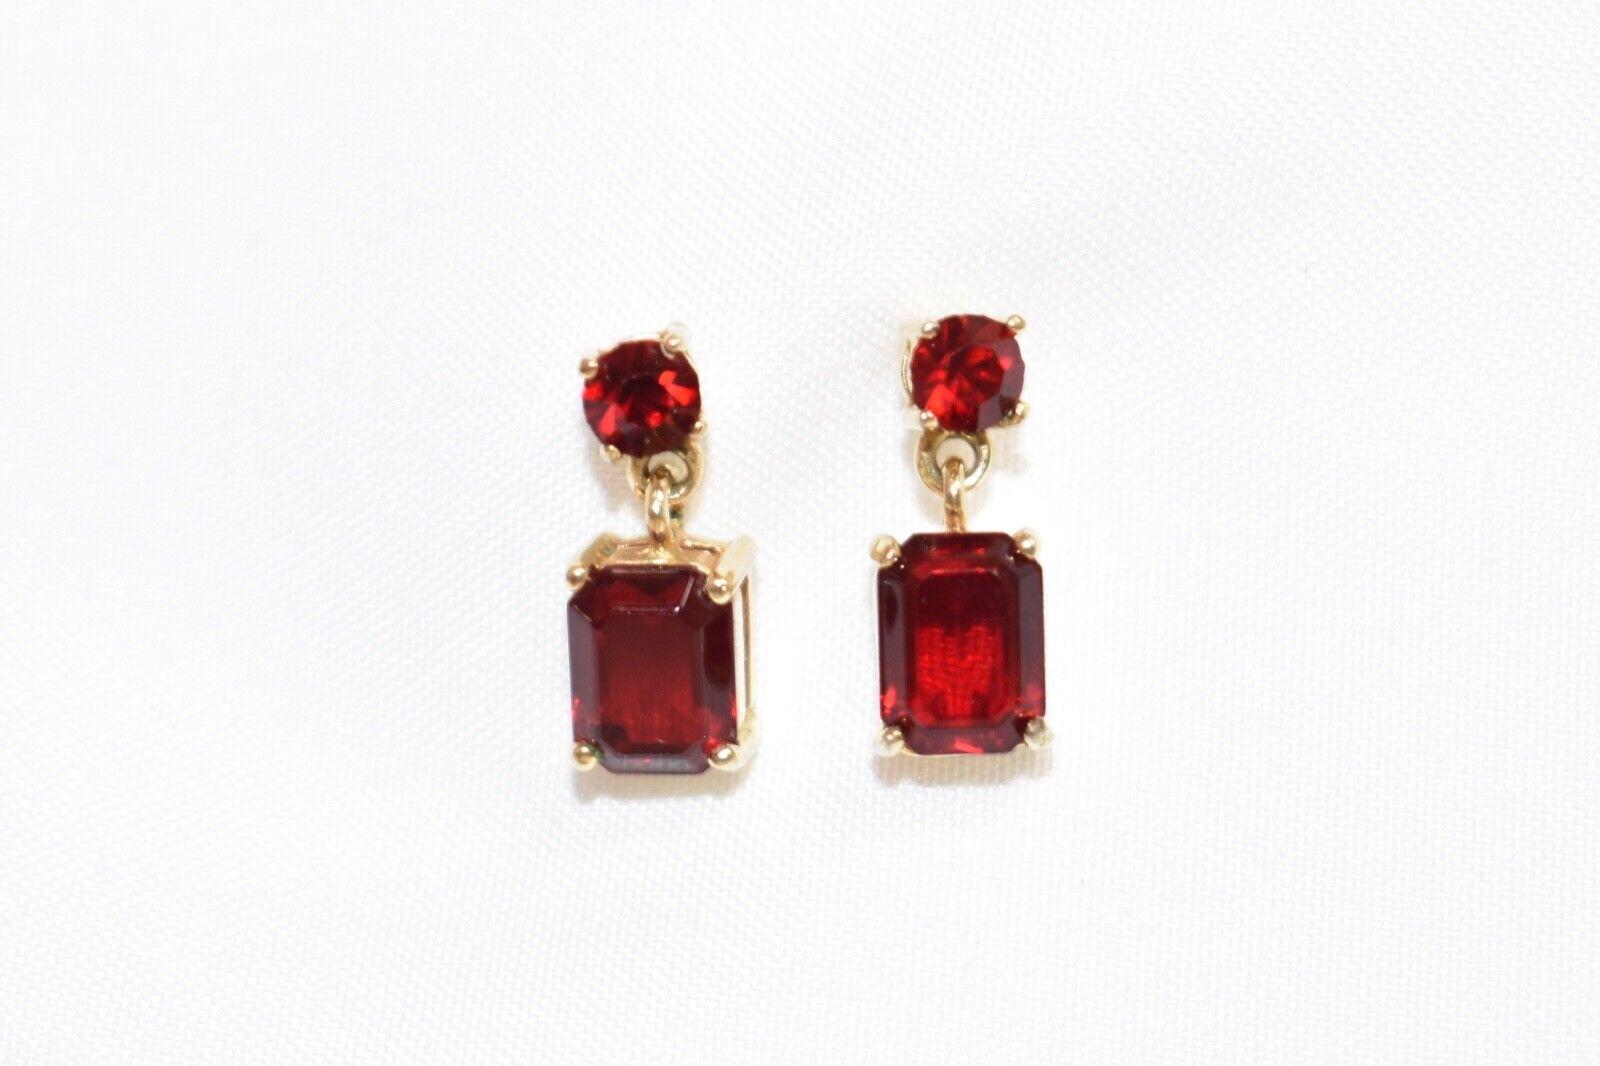 14k yellow gold dark red CZ dangle stud earrings